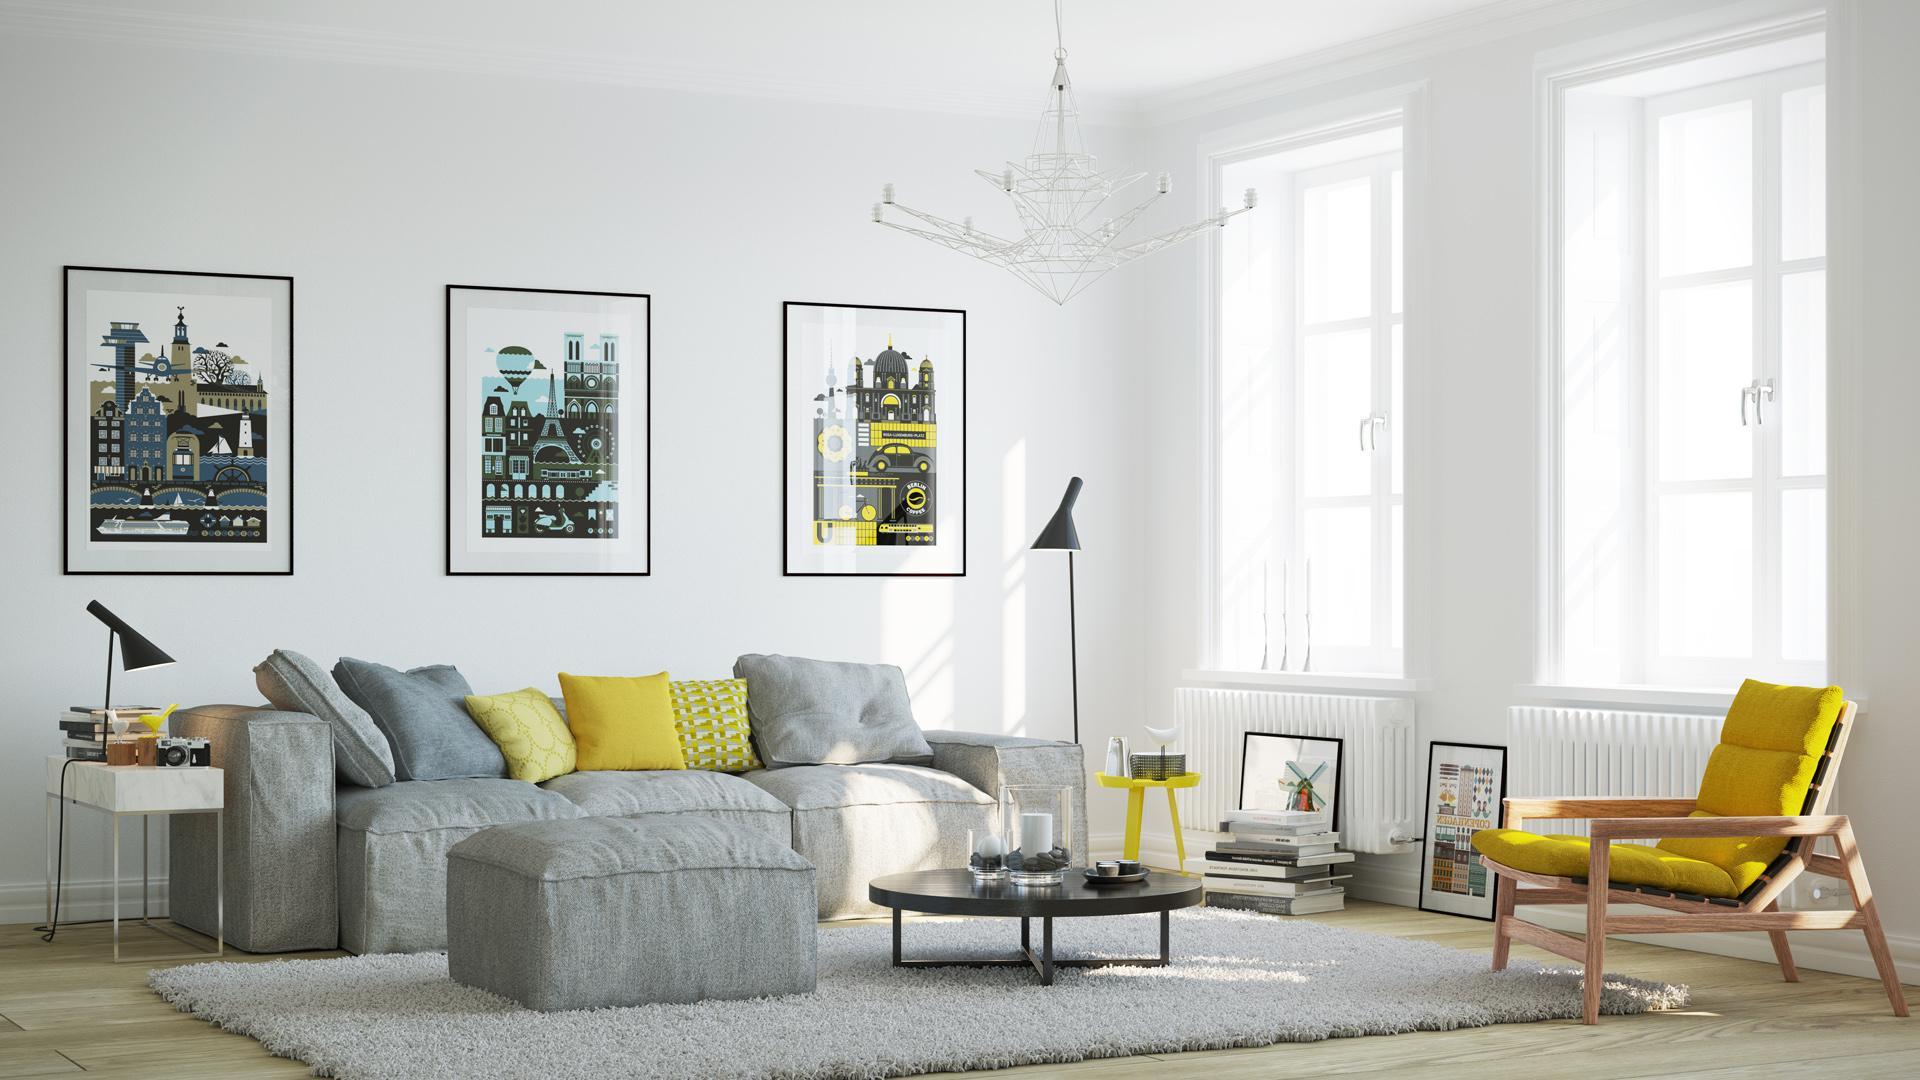 1 - Стили интерьера для маленькой квартиры